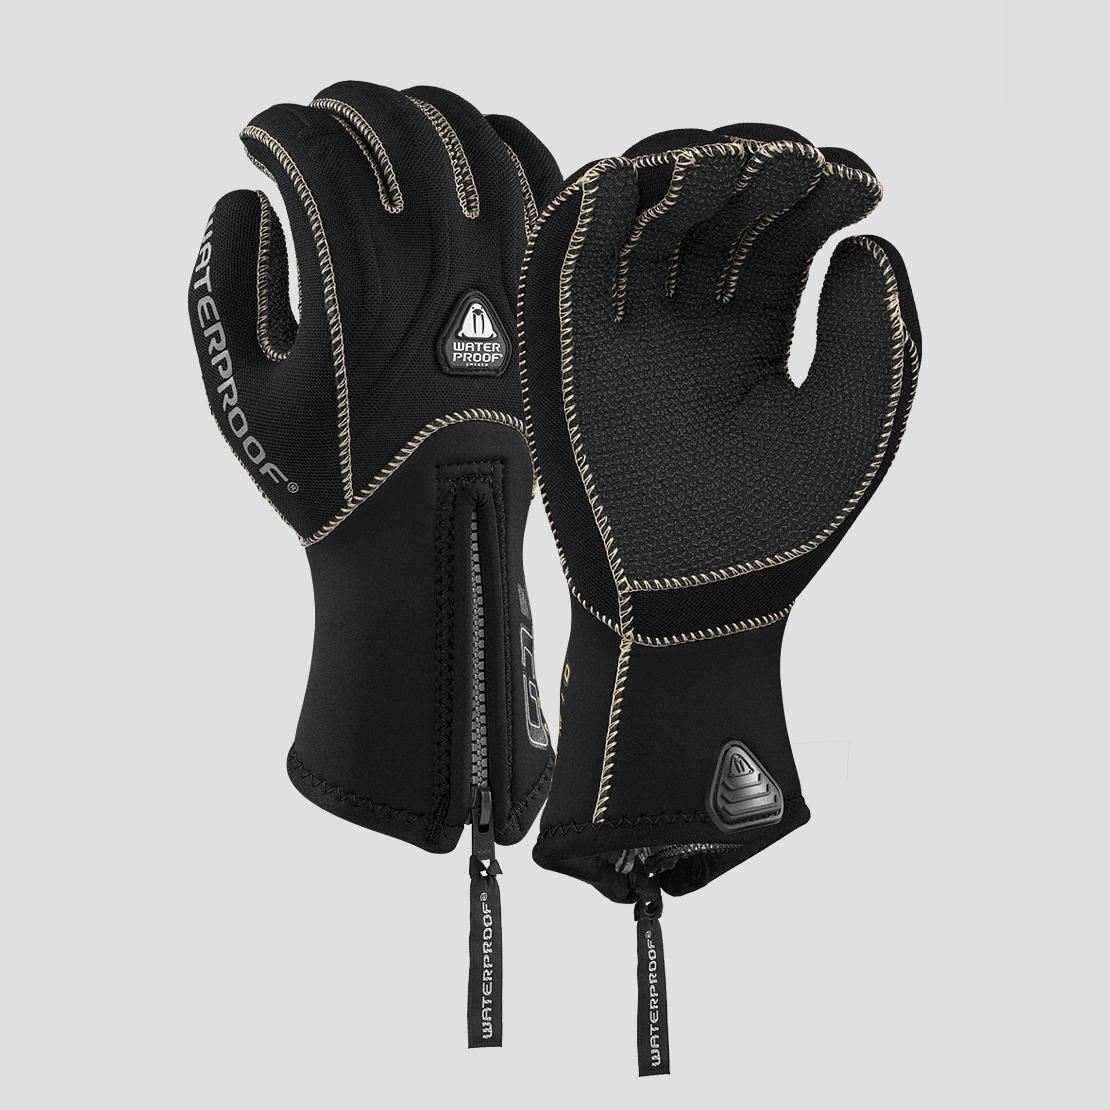 Waterproof G1 Kevlar 5MM 5-FINGER